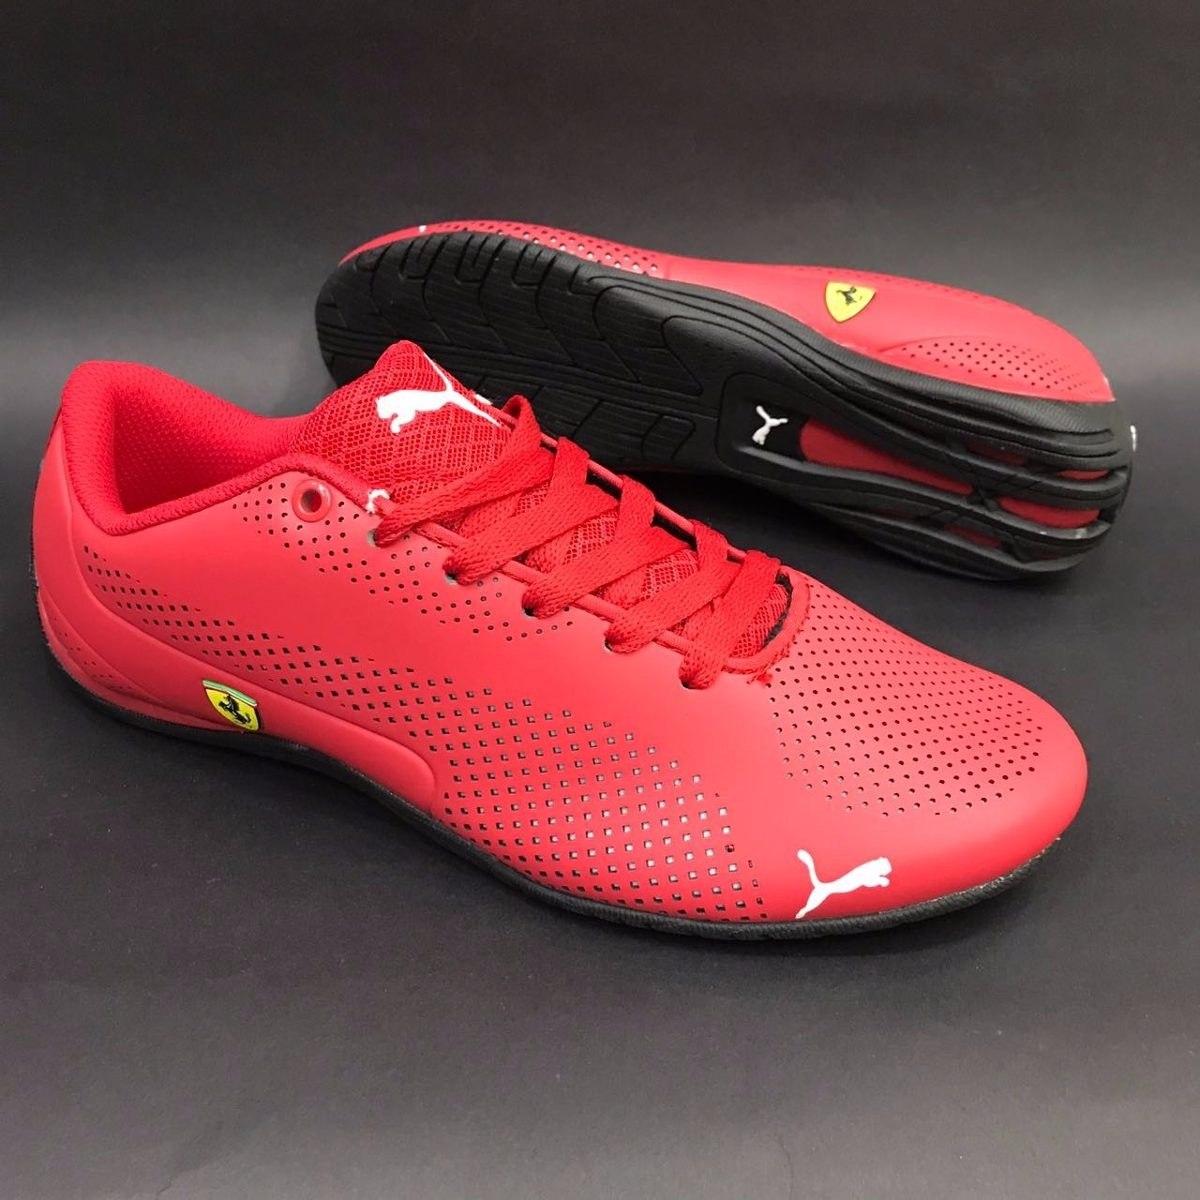 Tenis Zapatillas Puma Ferrari Roja Hombre Envio Gratis